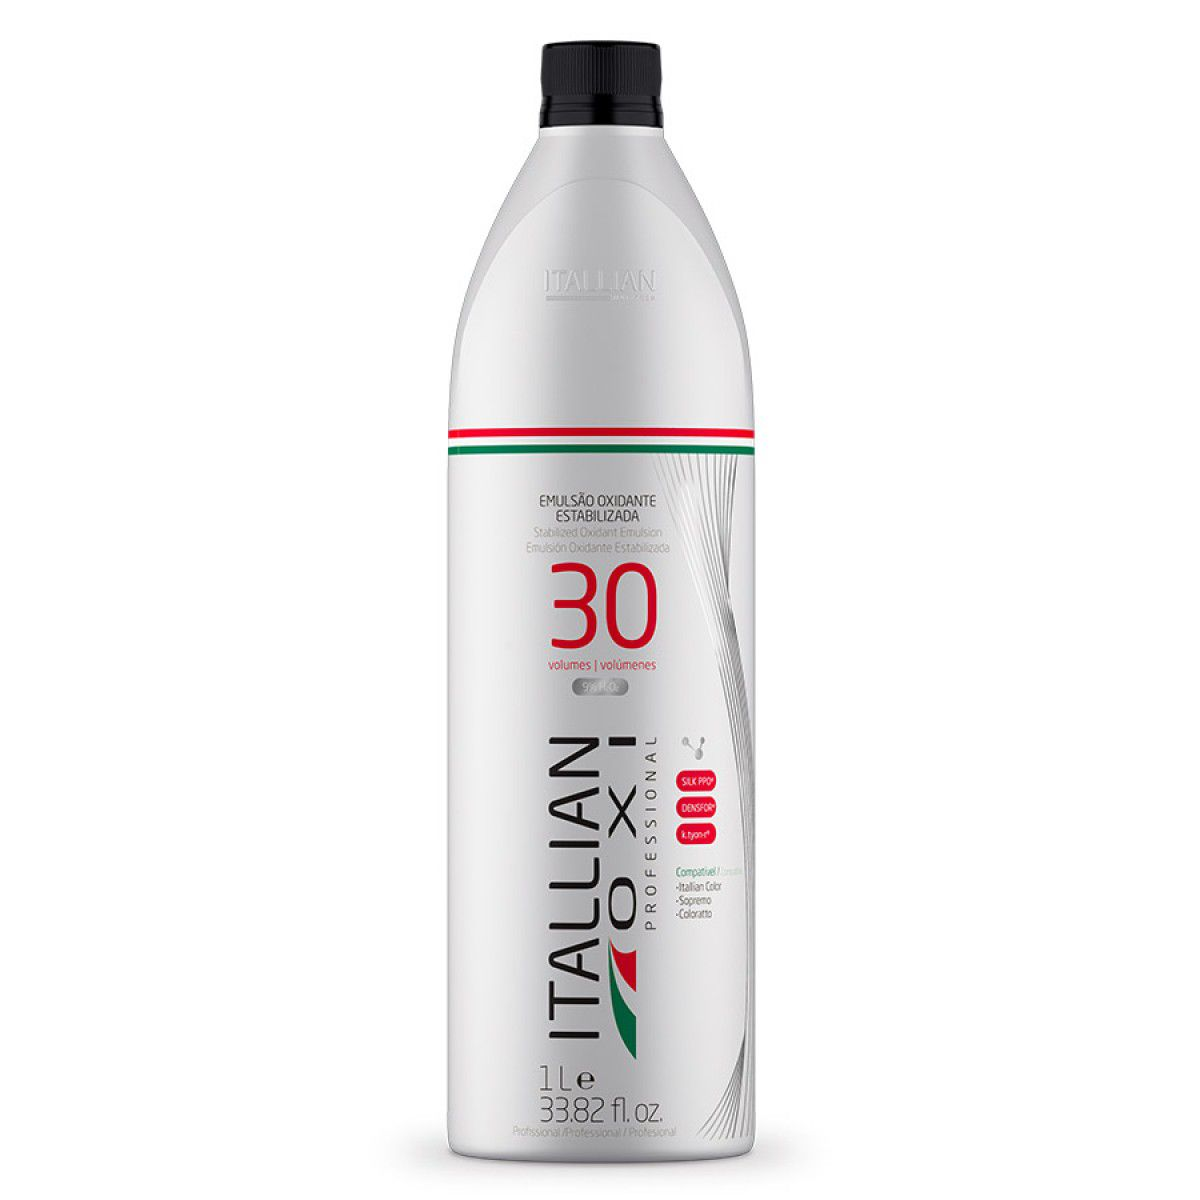 Pó Descolorante Itallian Color Premium Powder + Ox 30vol